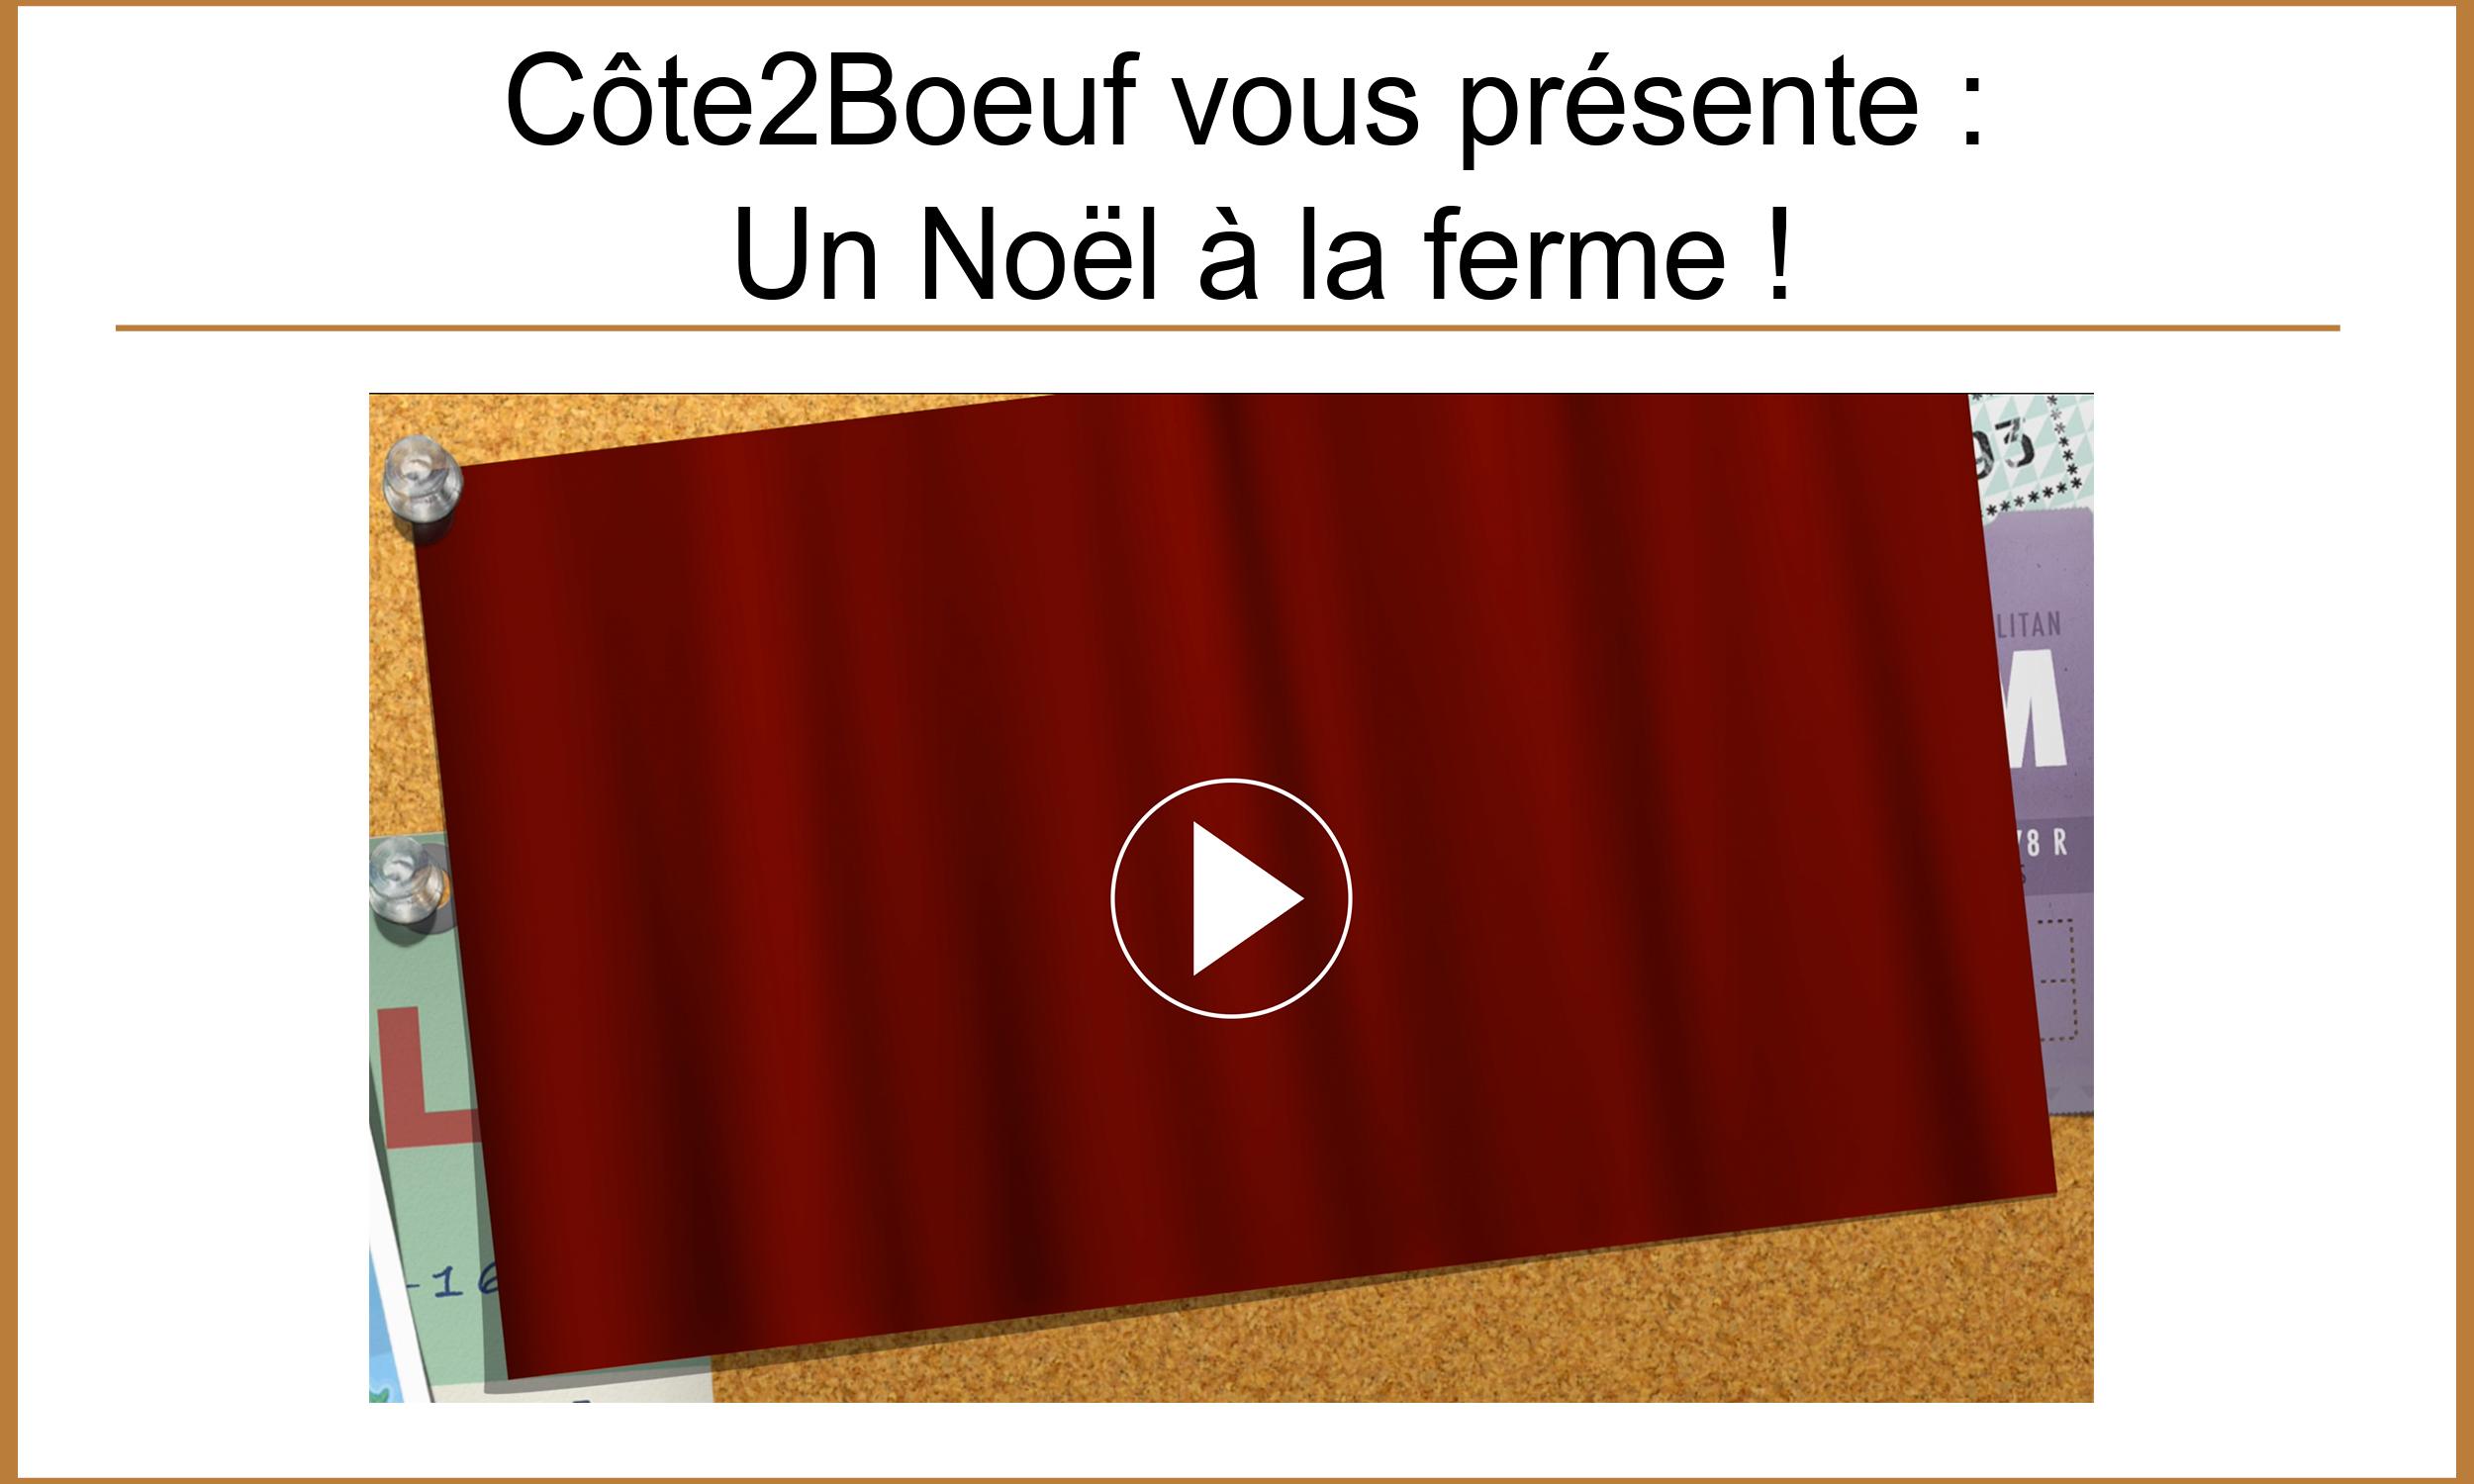 vidéo noël 2016 chez Cote2Boeuf